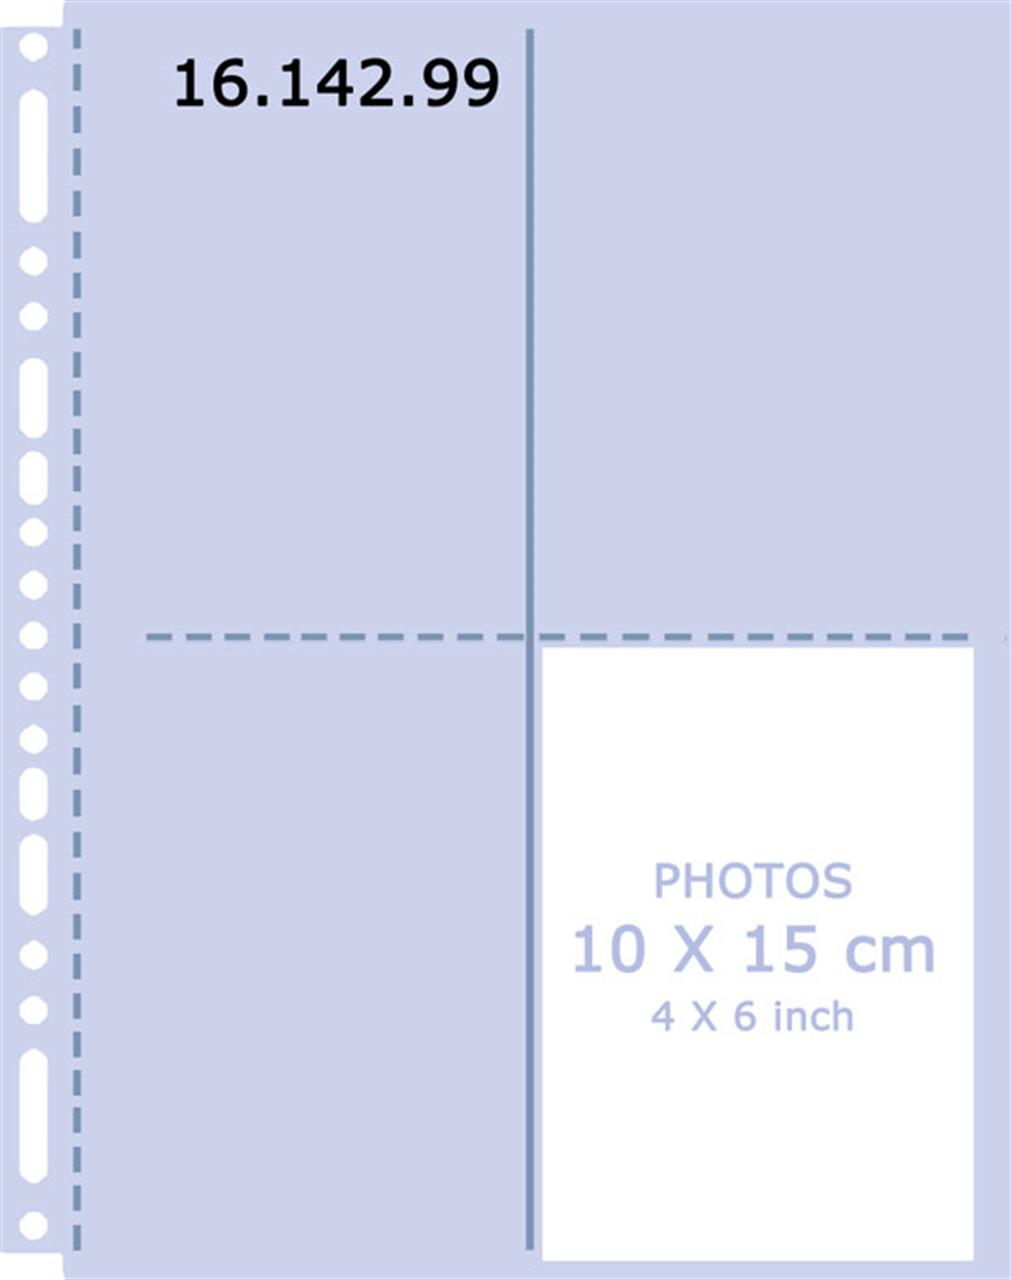 8711229161428__transparant-foto-sheets-4x-10x15-1614299.jpg